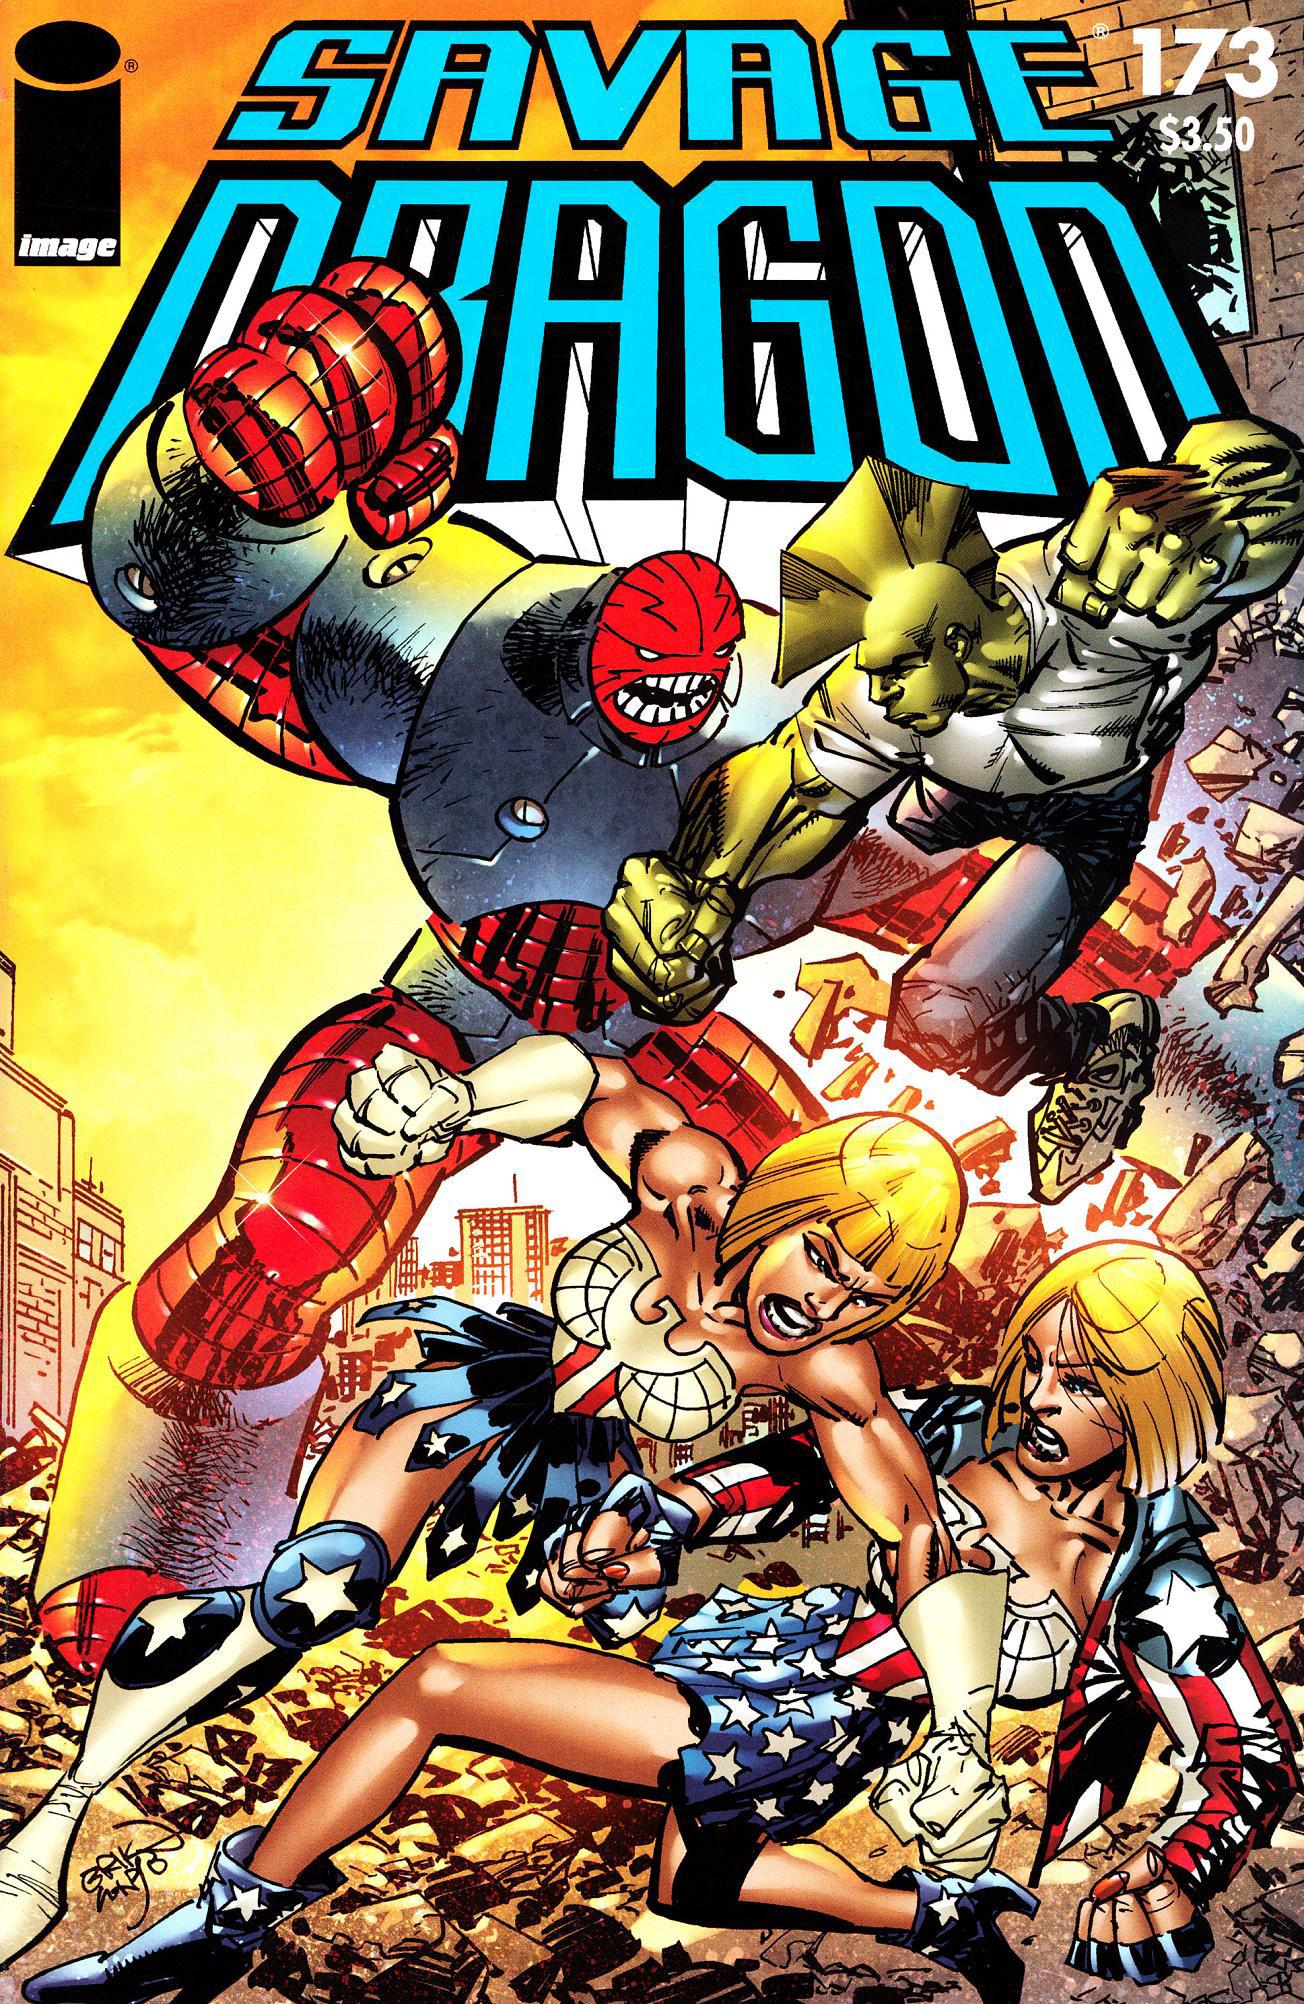 Cover Savage Dragon Vol.2 #173